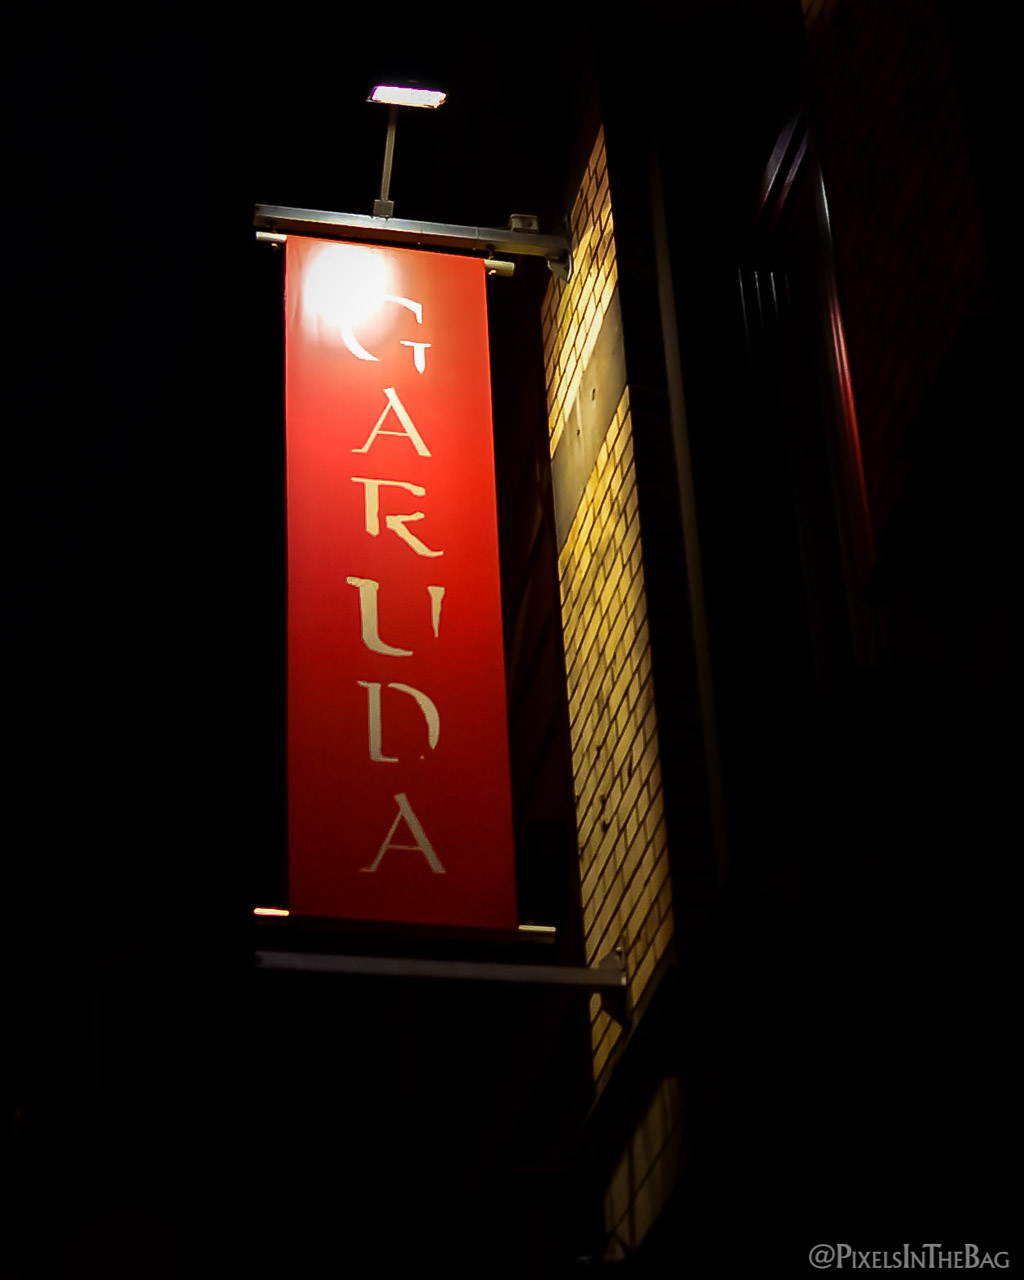 A l'entrée de Garuda.